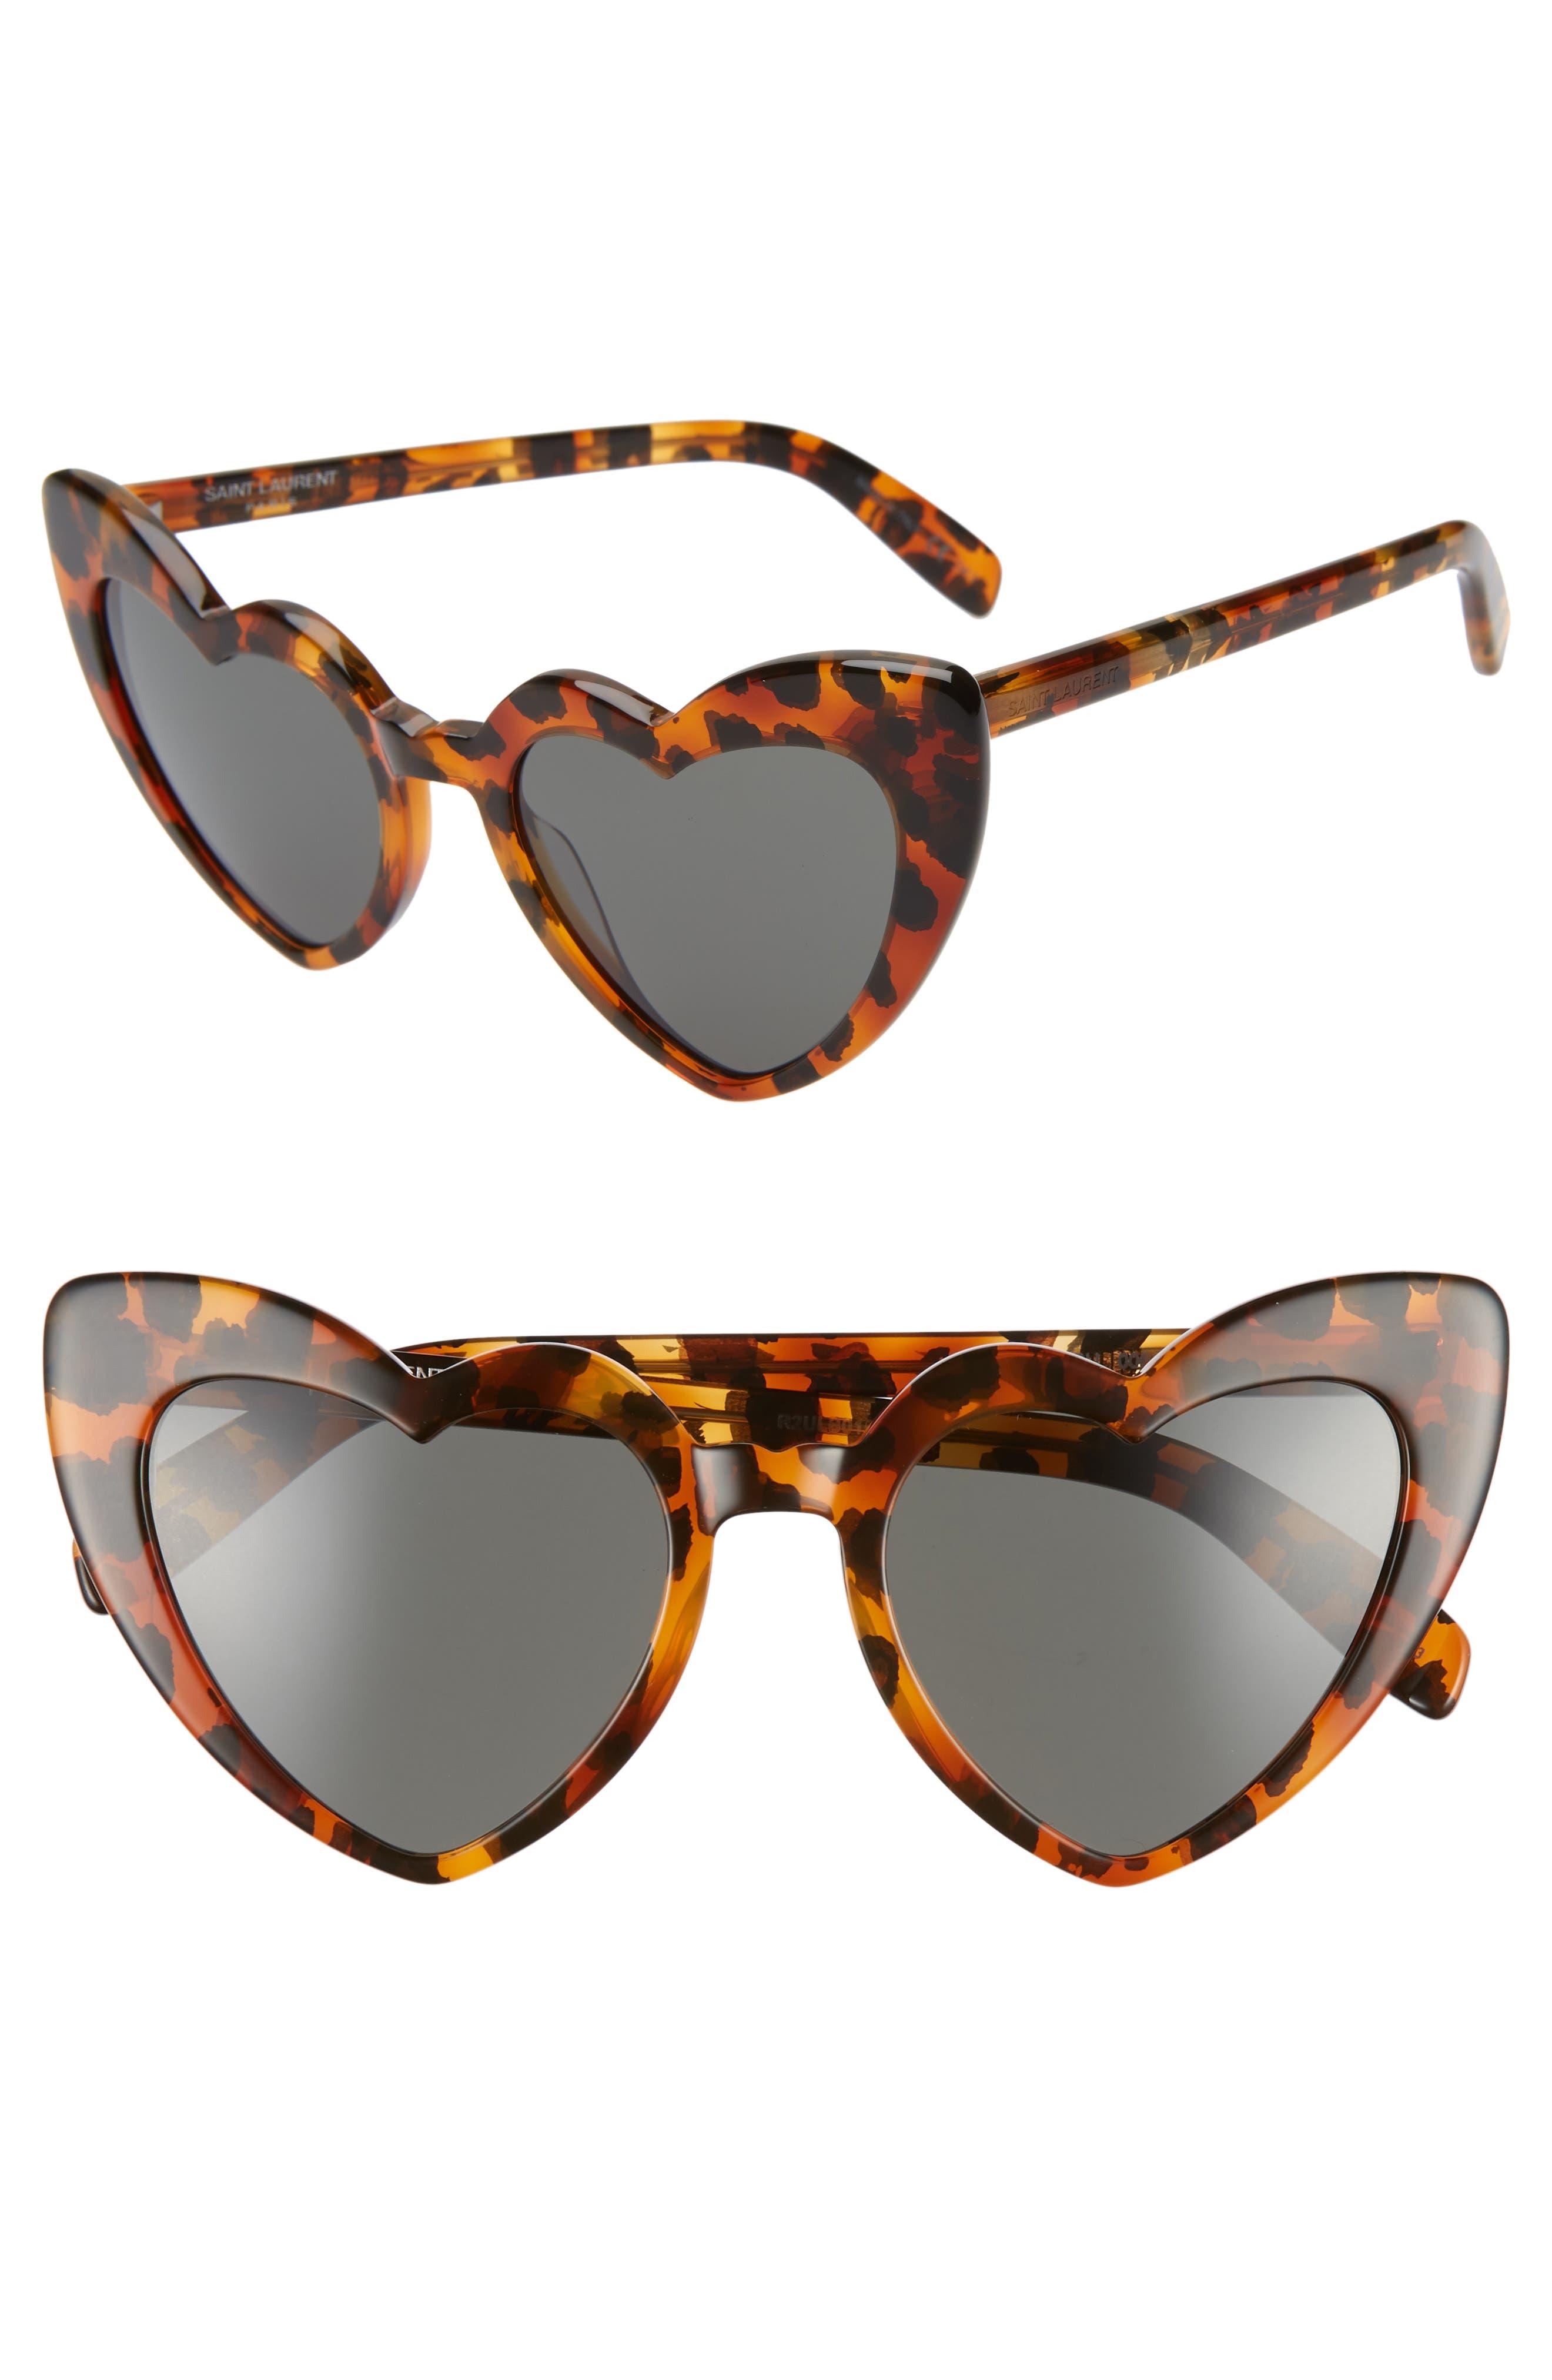 Loulou 54mm Heart Sunglasses,                             Main thumbnail 1, color,                             LEOPARD HAVANA/ GREY